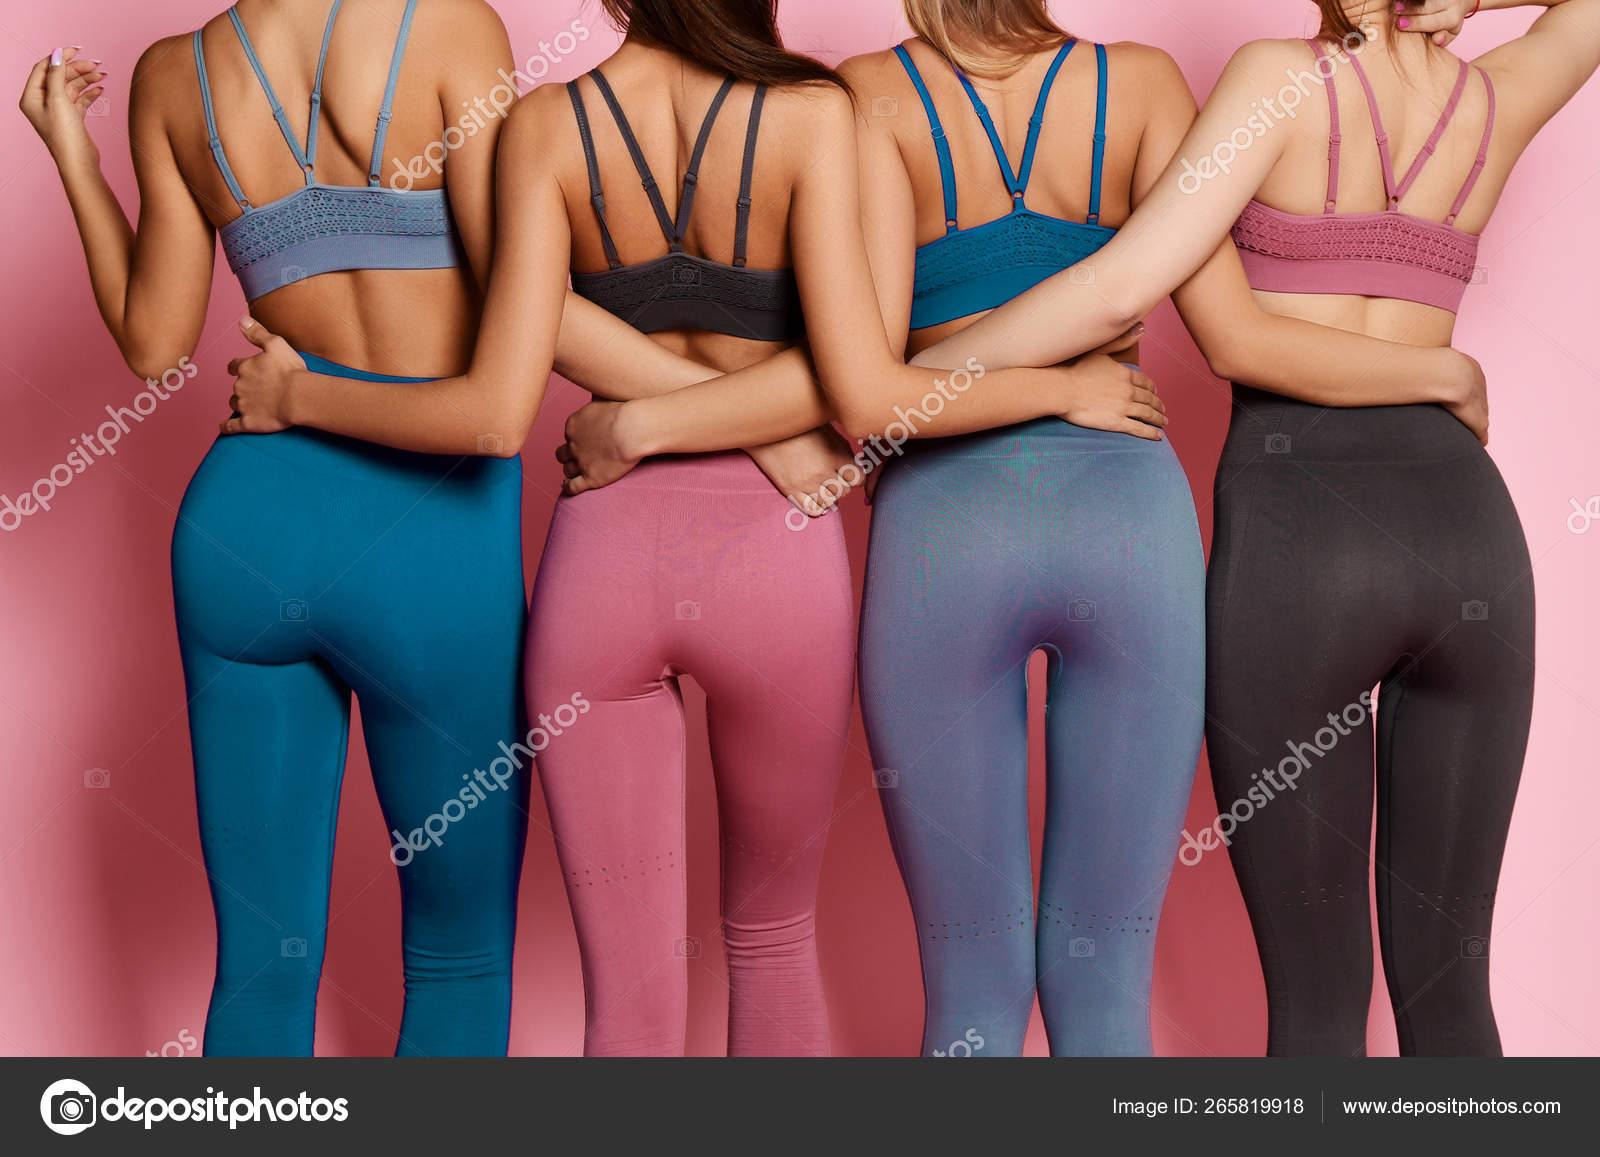 Girls posing ass hot naked pics